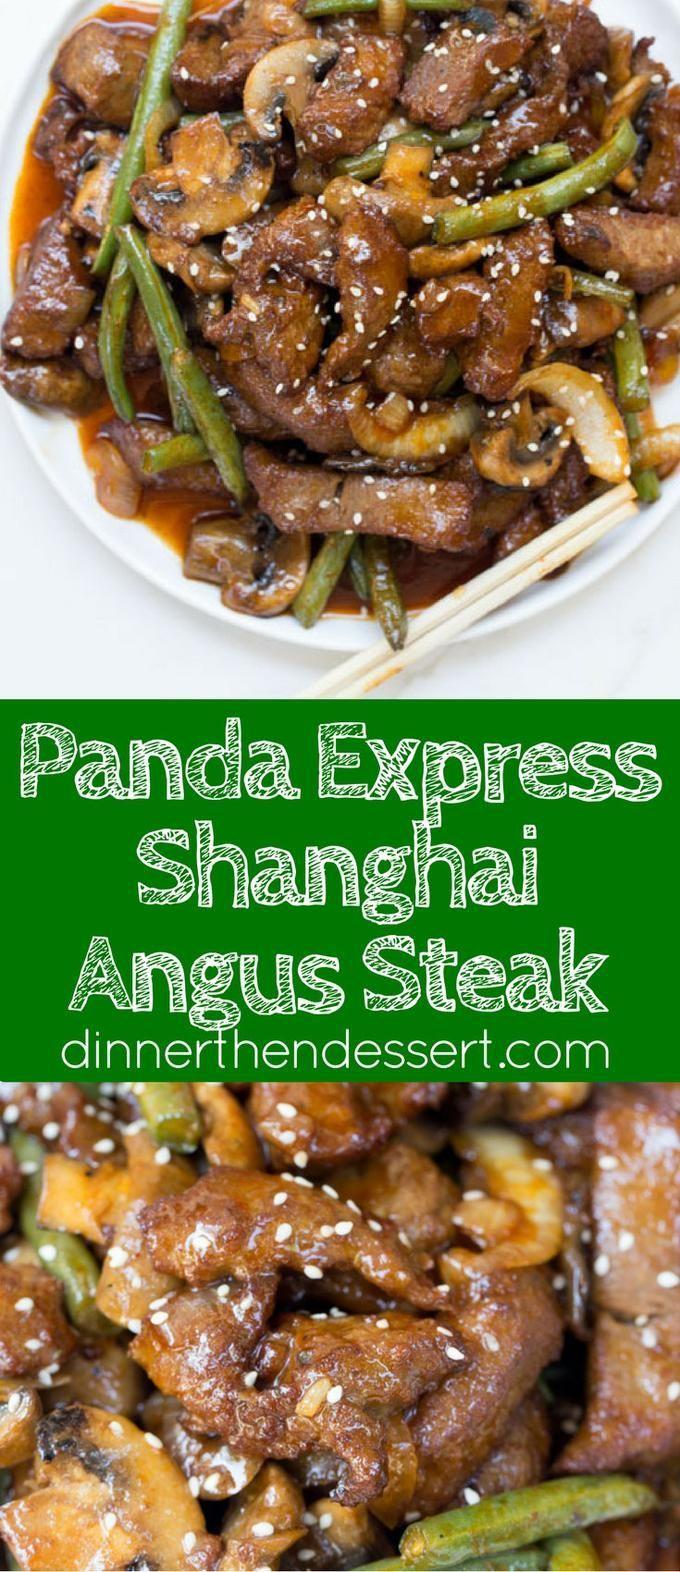 Panda express shanghai angus steak is a quick stir fry dish with panda express shanghai angus steak is a quick stir fry dish with thinly sliced asian recipesbeef recipeschinese forumfinder Gallery